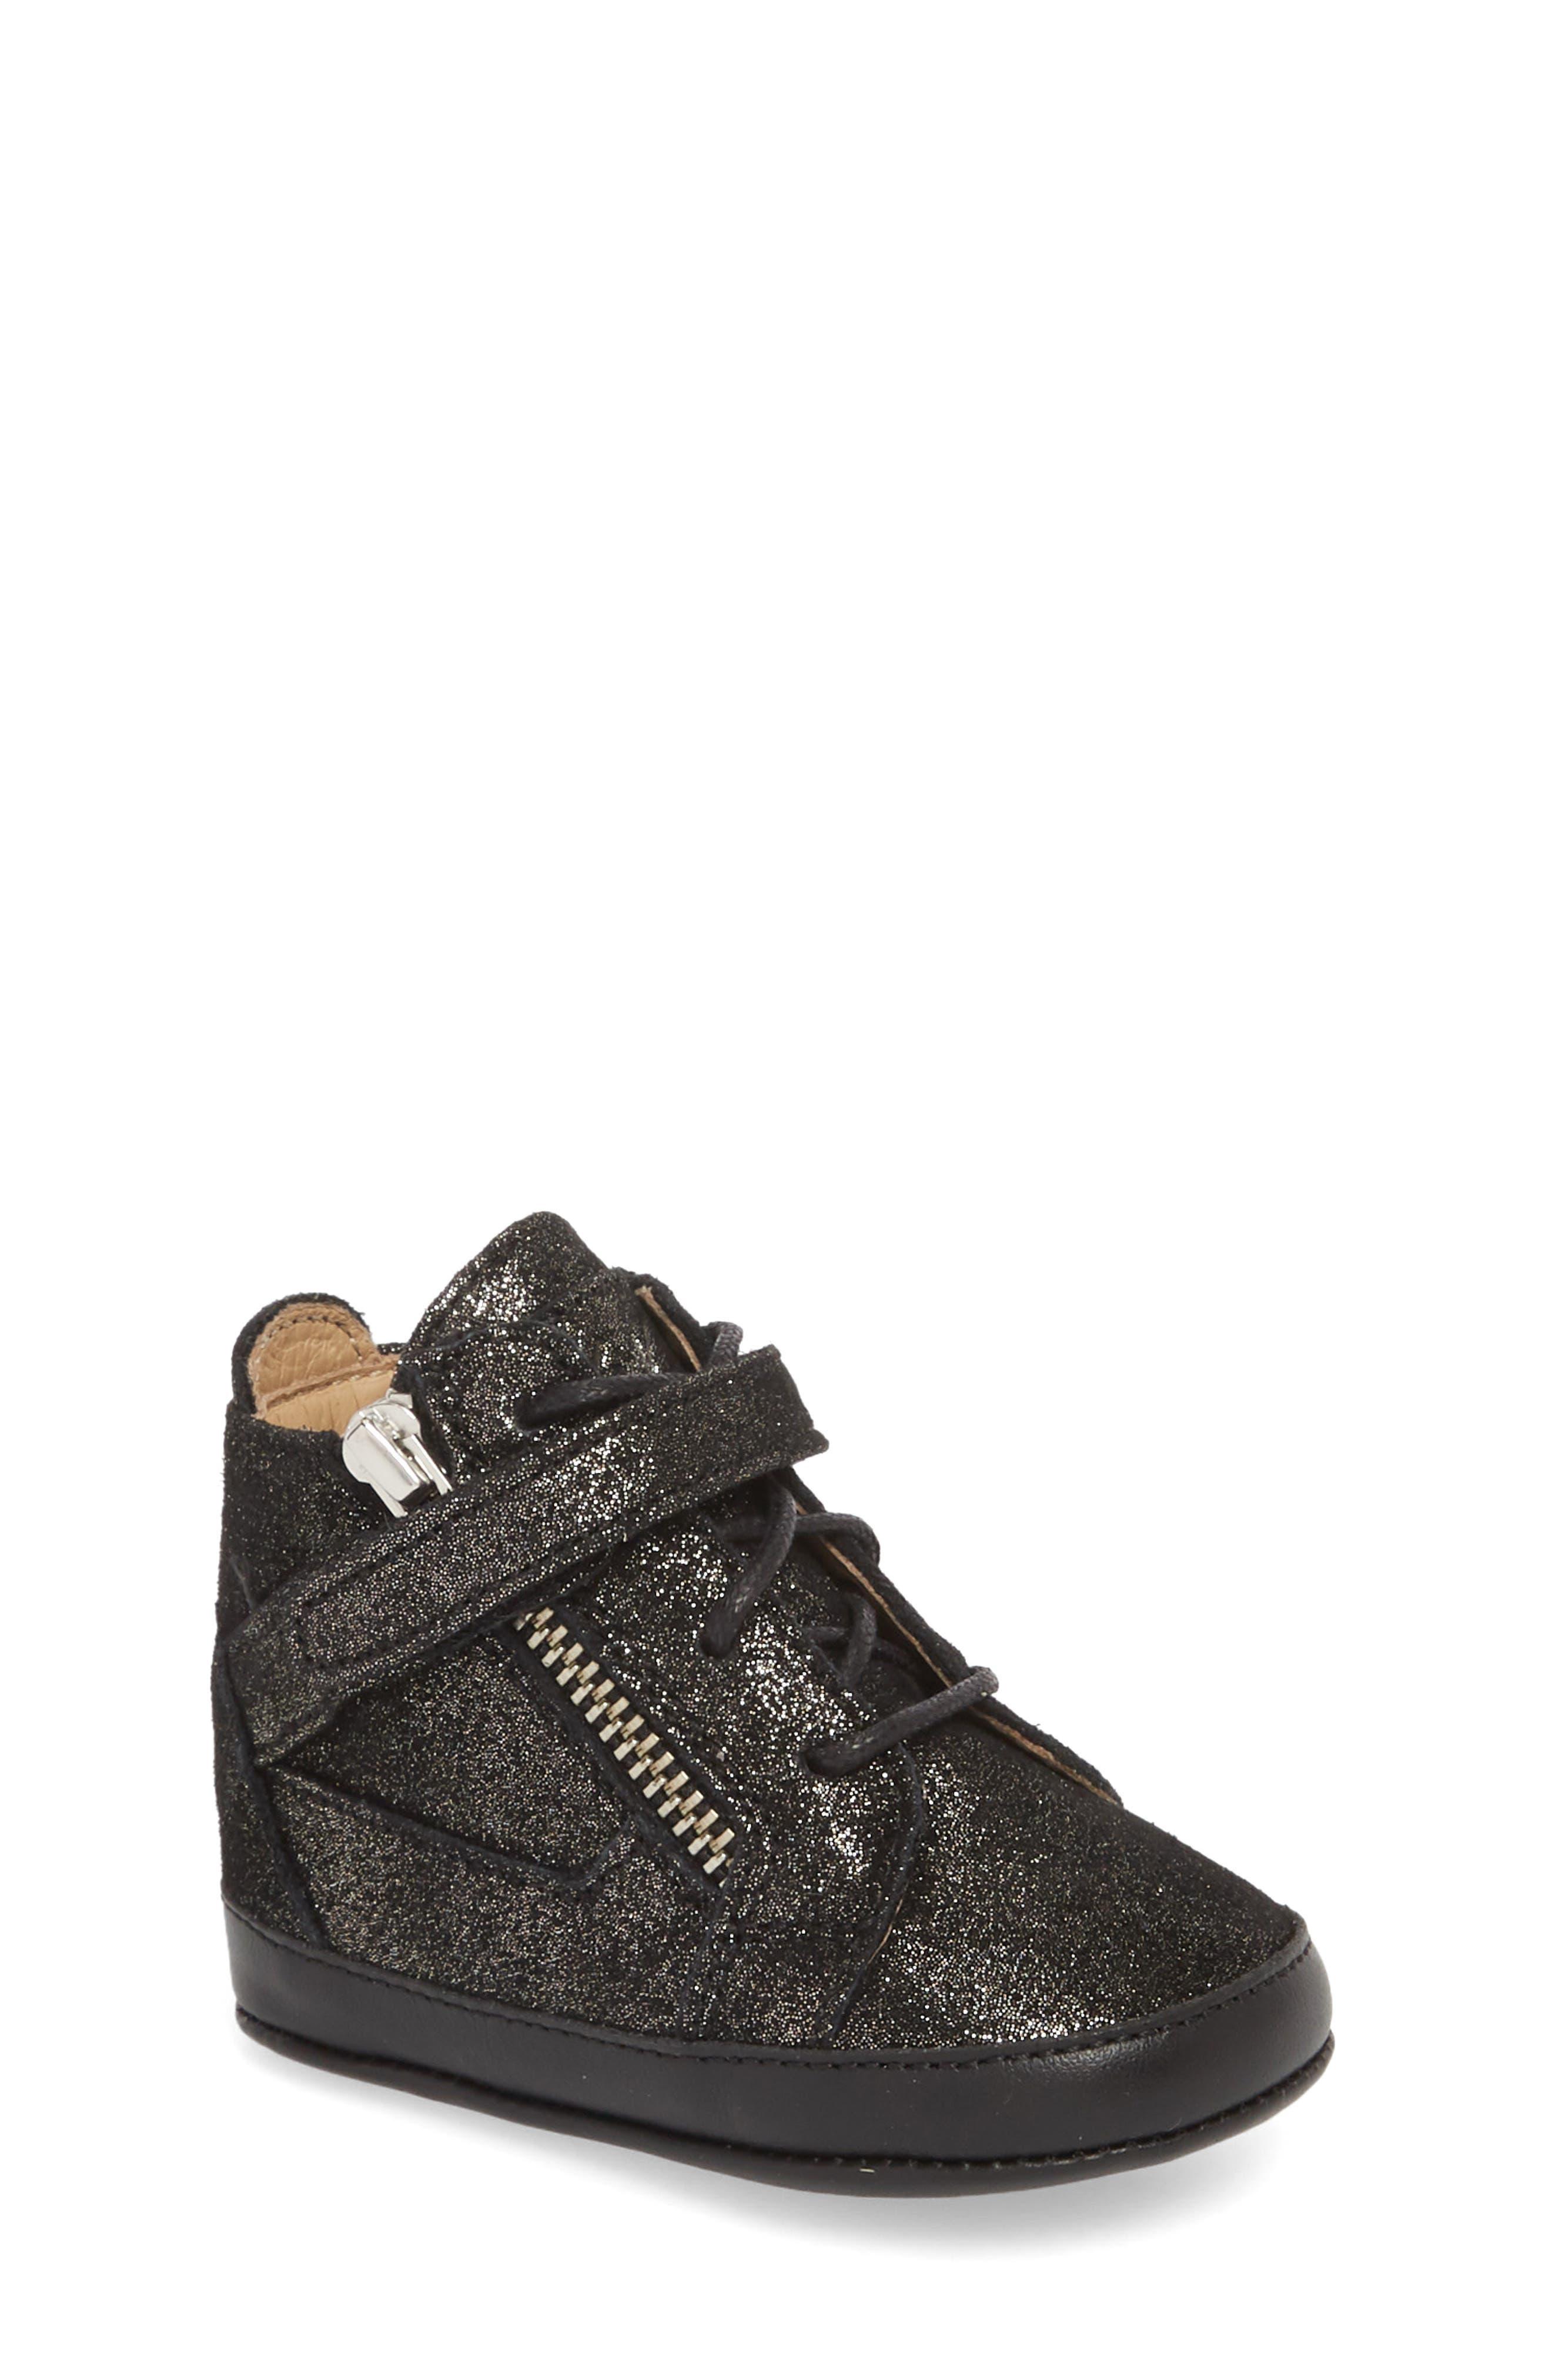 Culla London High Top Crib Sneaker,                             Main thumbnail 1, color,                             Black Glitter